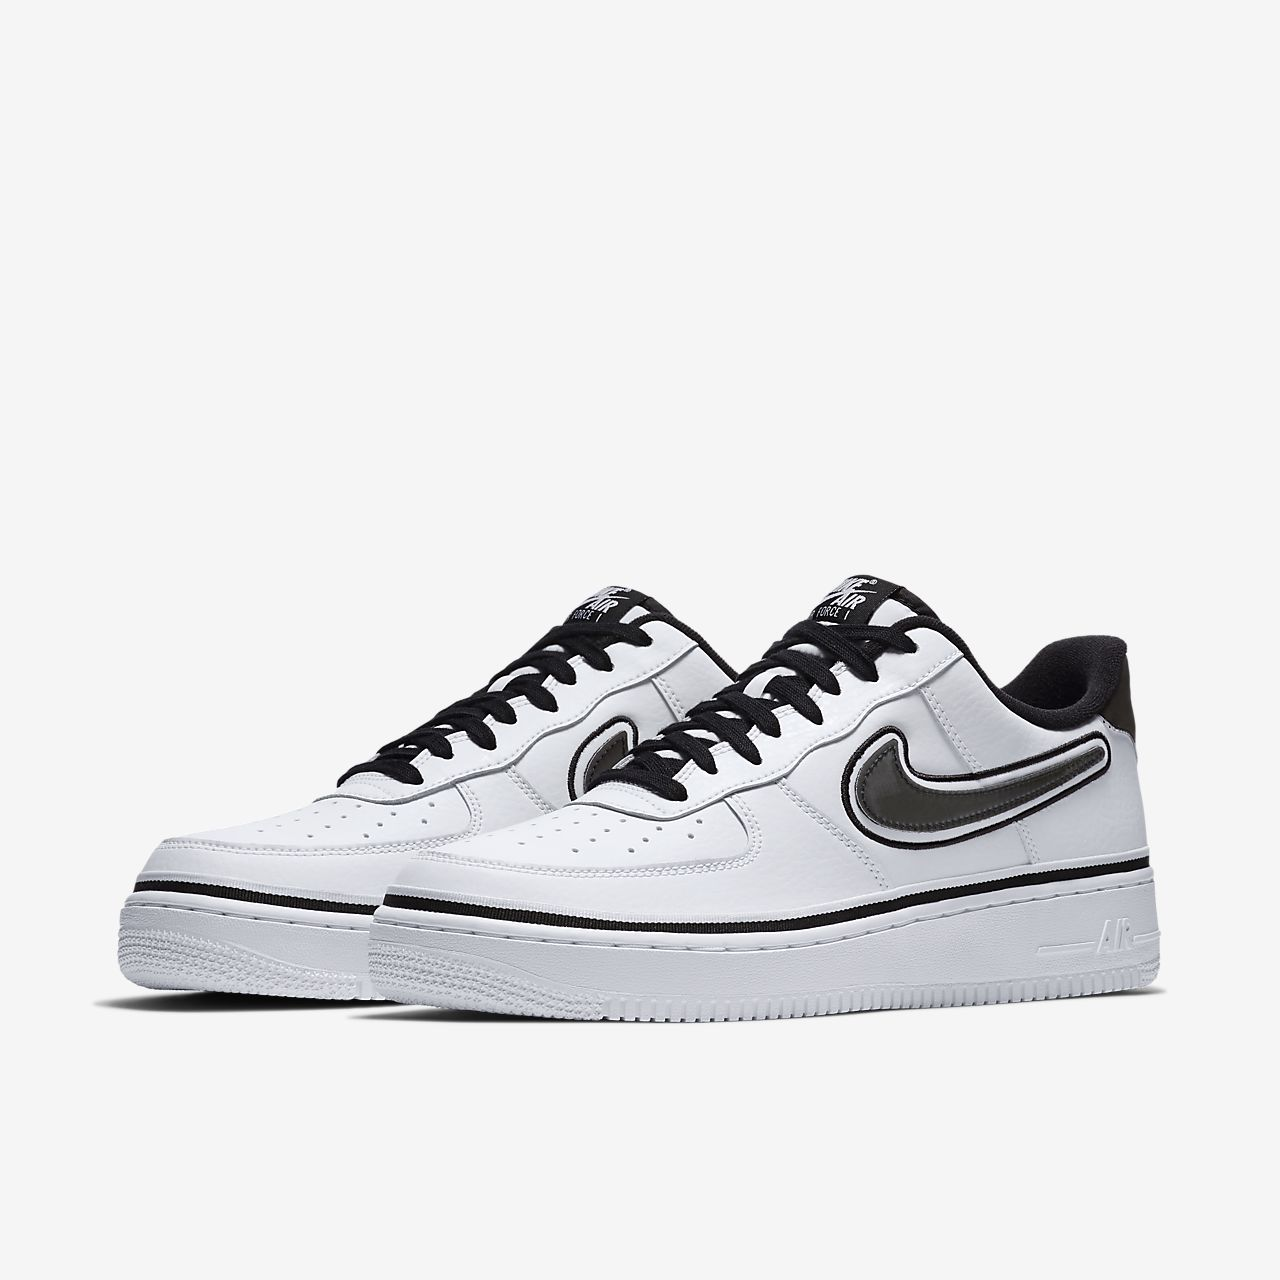 new arrival 5423c 72efa ... Nike Air Force 1  07 LV8 Sport NBA Shoe